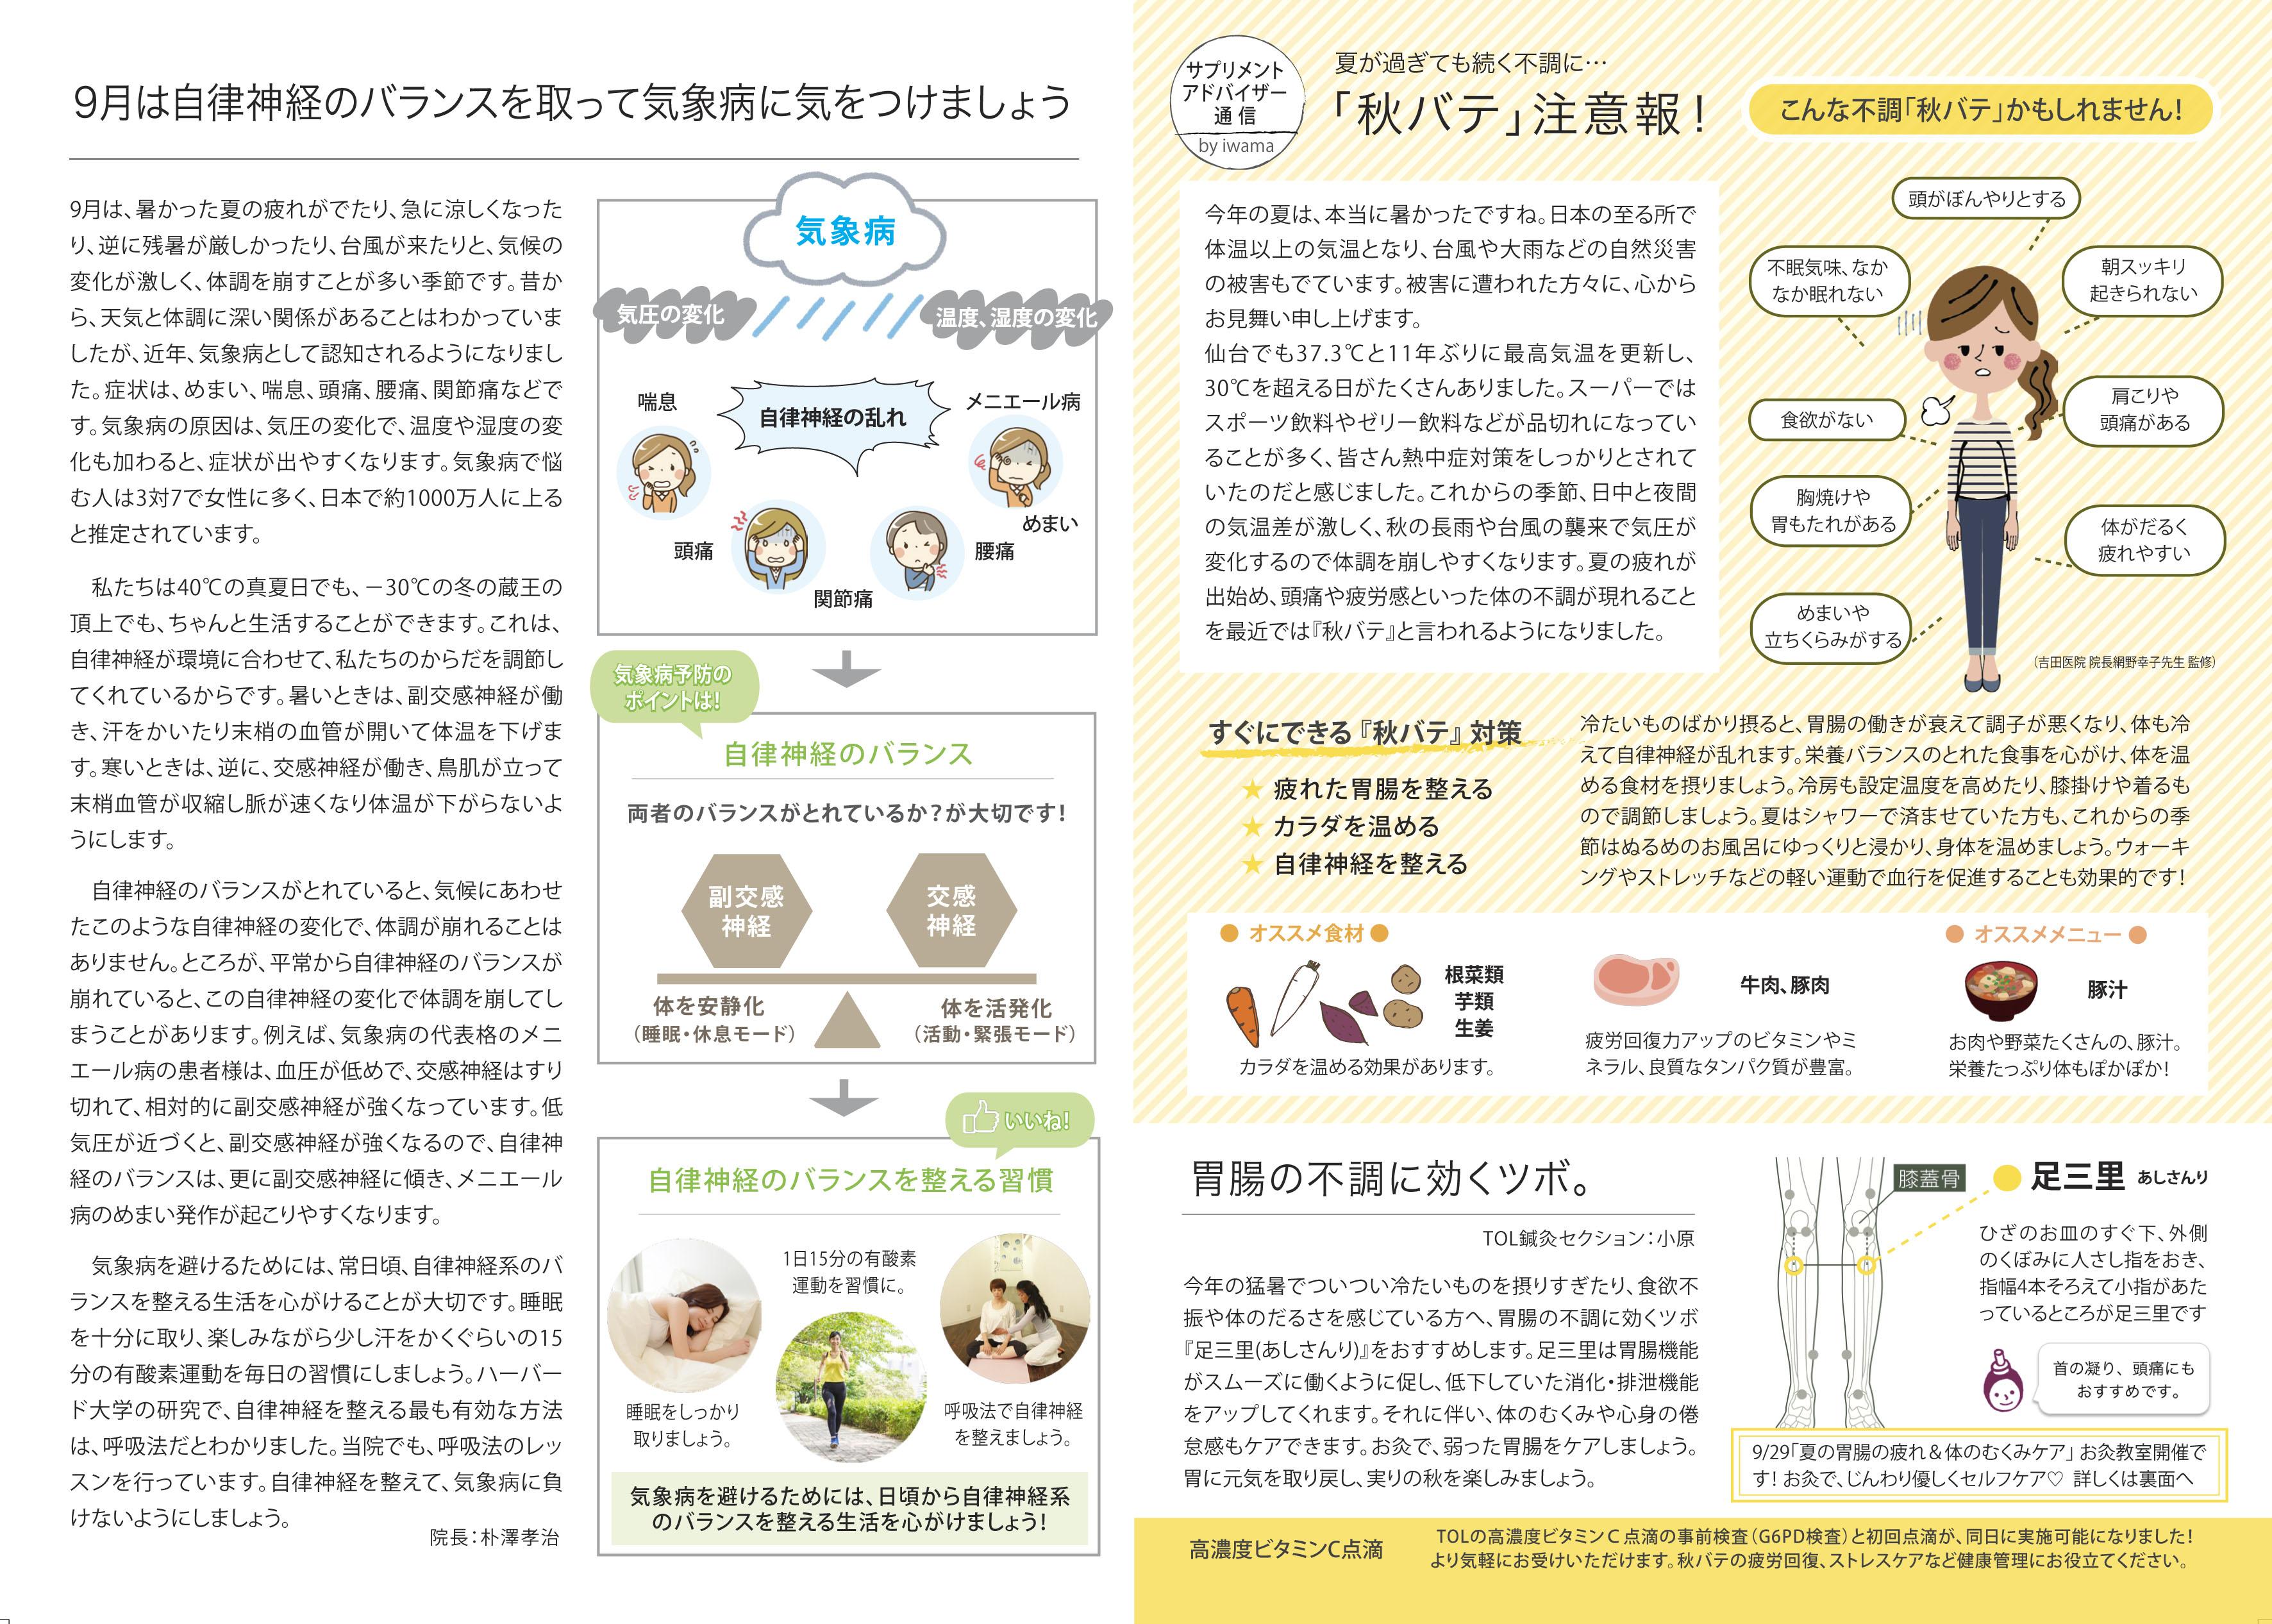 http://hozawa.jp/news/news_img/newsletter_ura1230.jpg